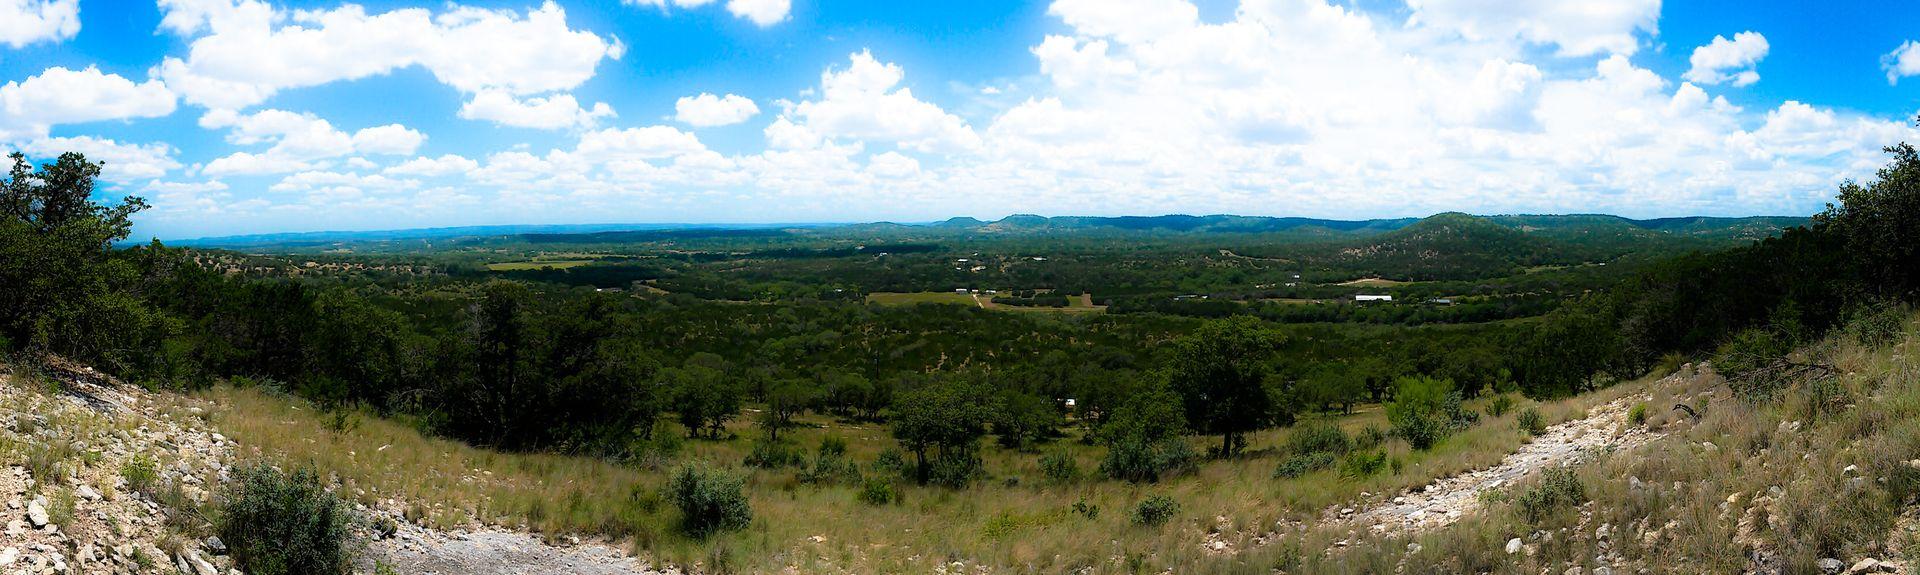 Pipe Creek, TX, USA